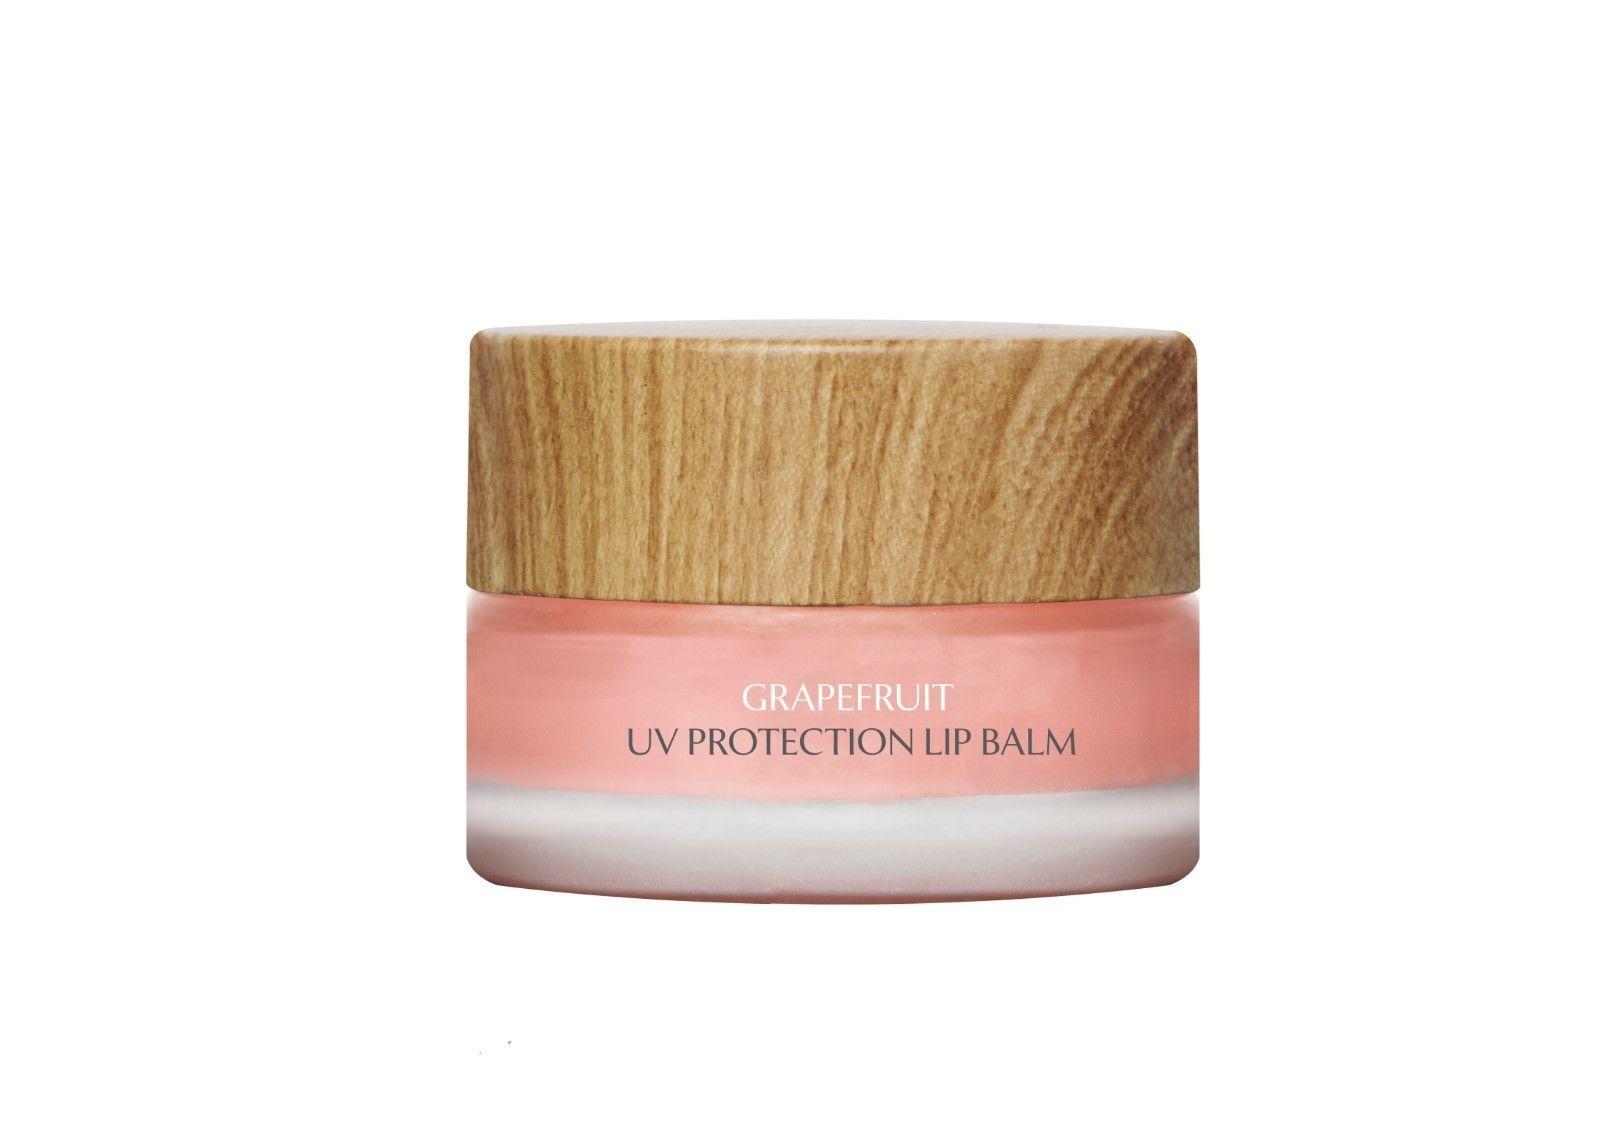 PureSense Grapefruit UV protection Lip Balm 5ml Deeply Nourish Your Lips